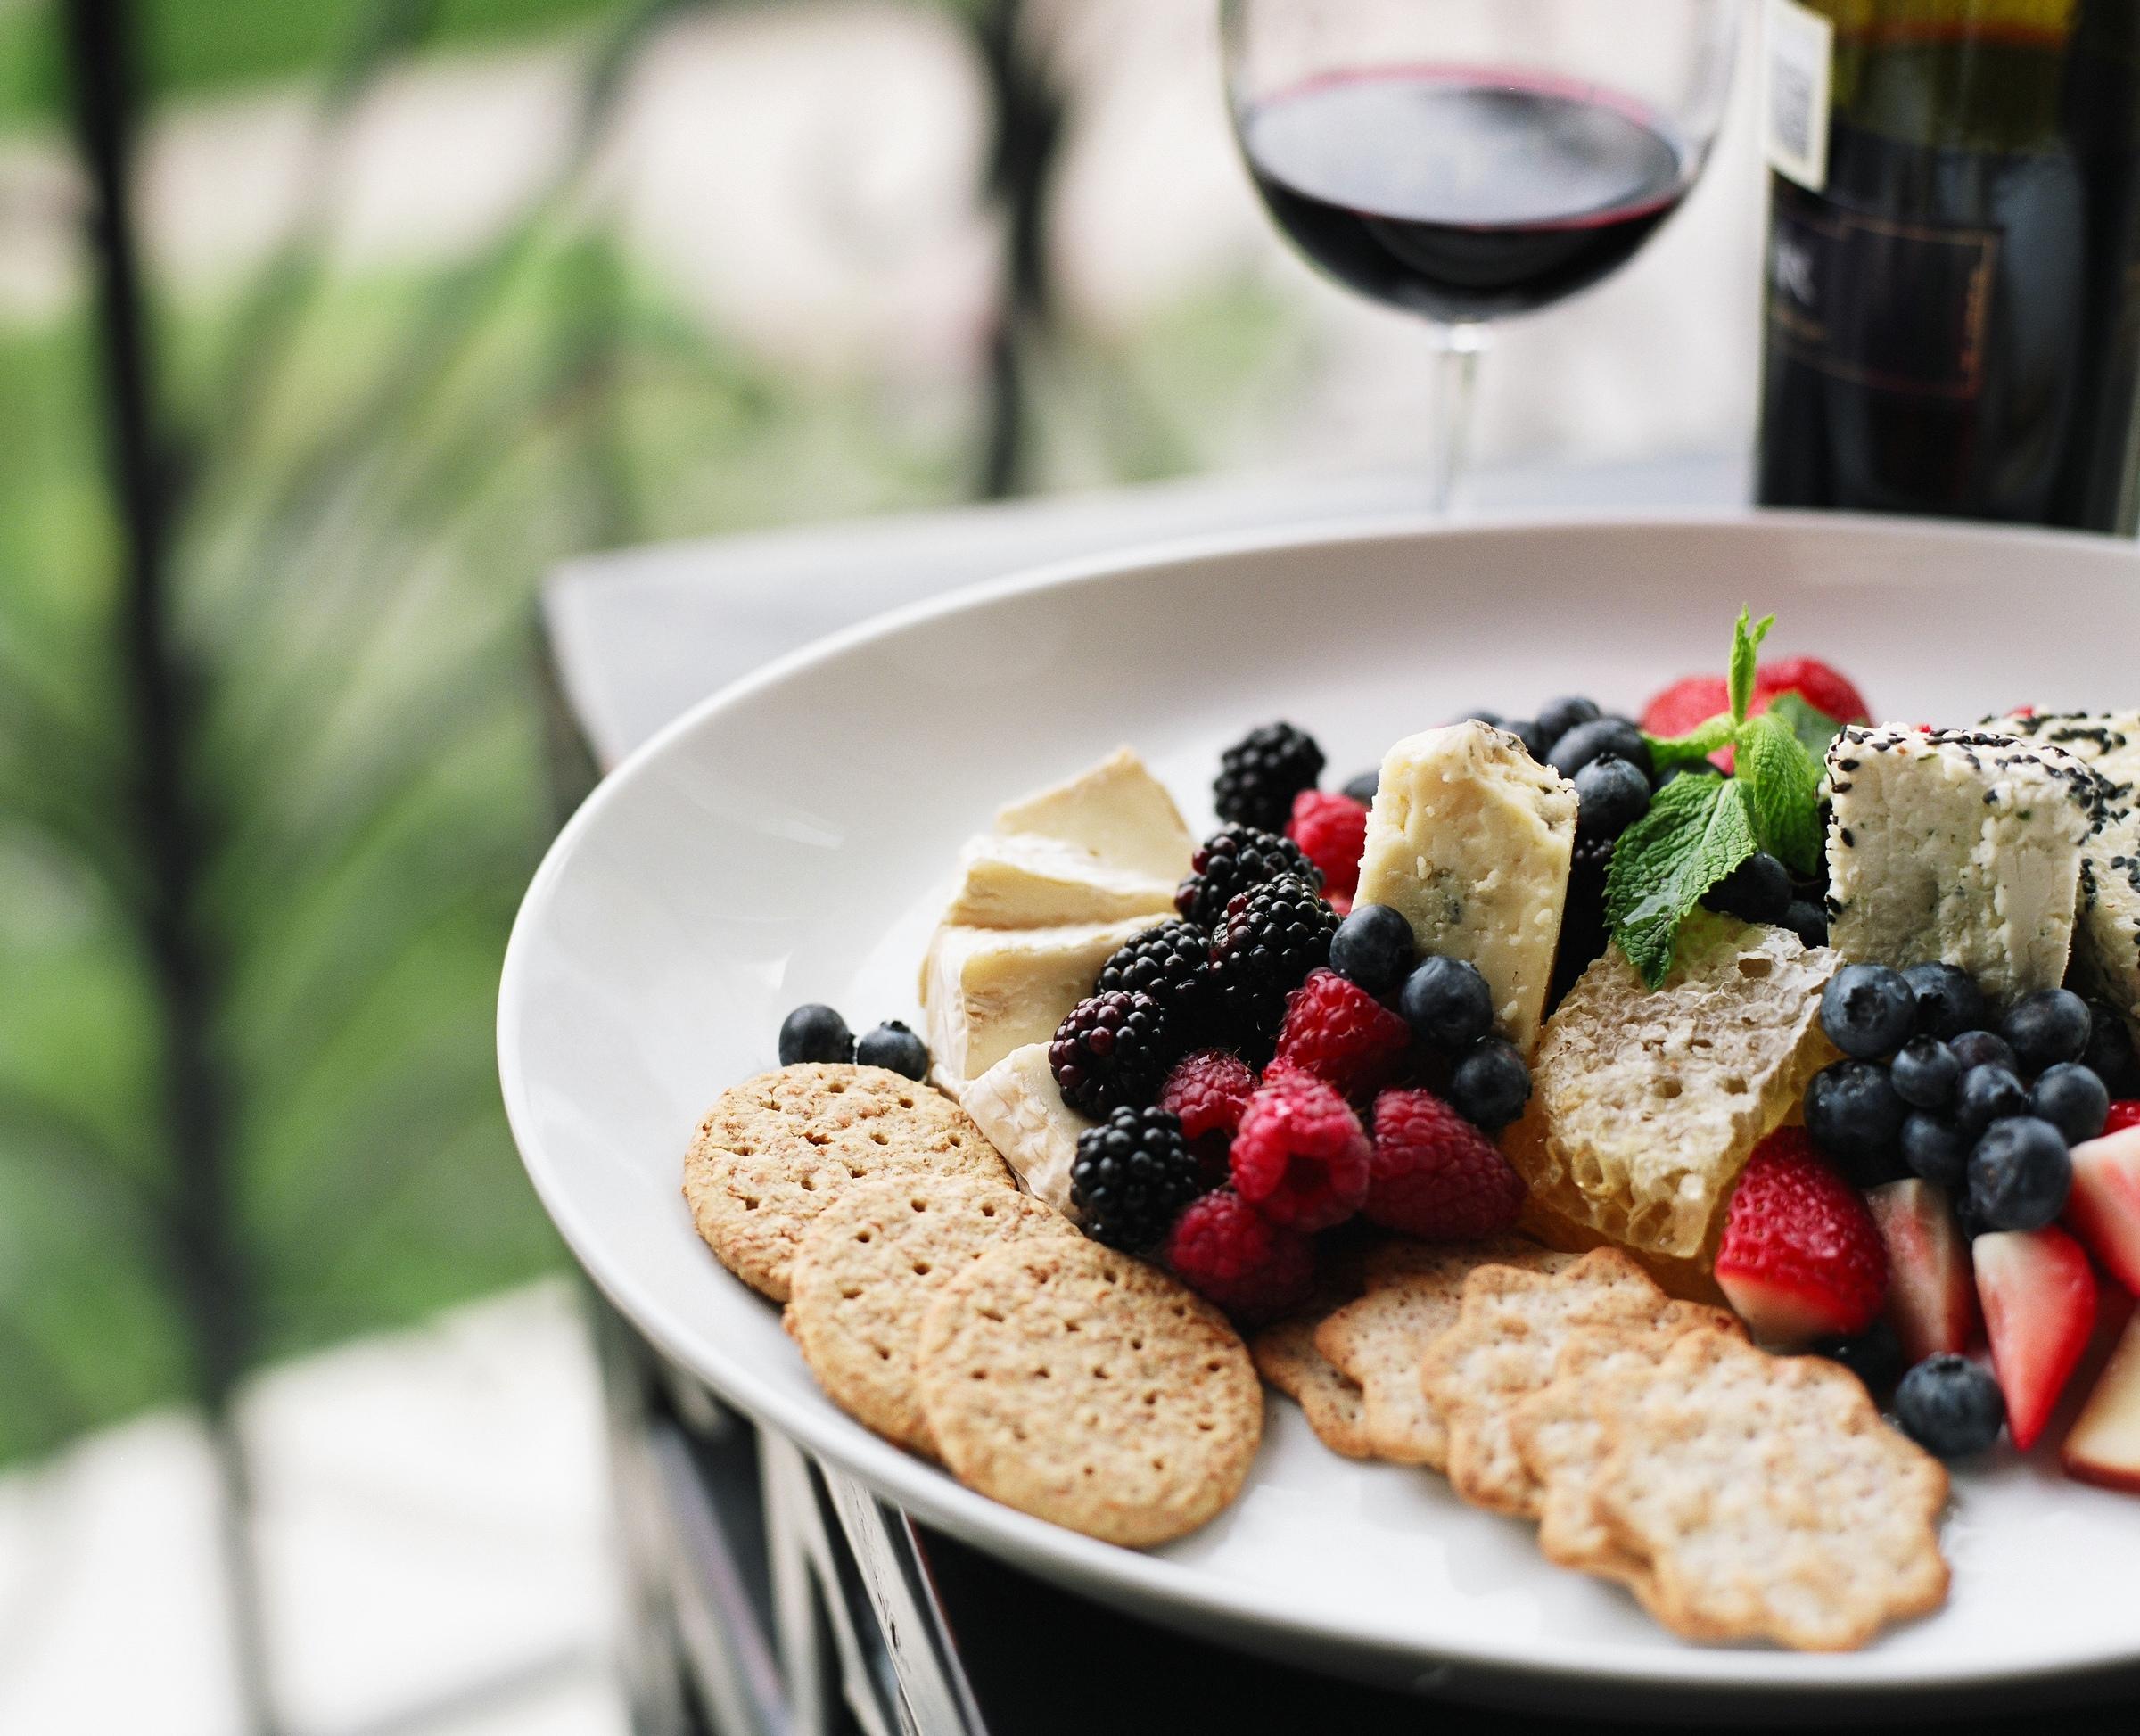 wine and cheese_p_15MB_2838271.jpg